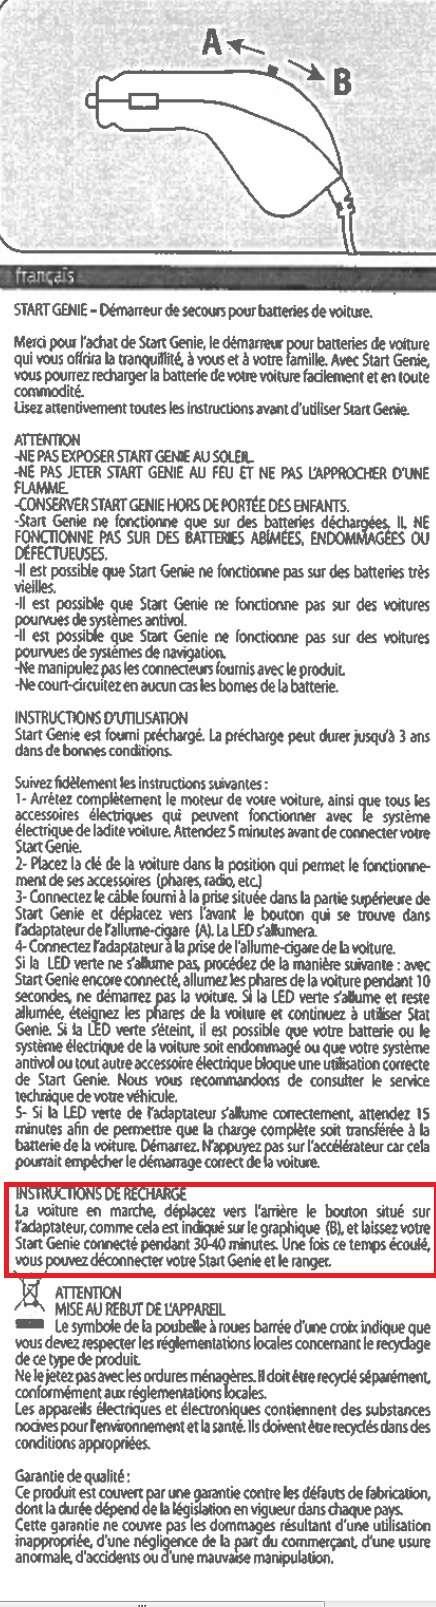 [ Alfa roméo Brera Spider 2.4JTDm an 2008 ] aide au démarage avec START GENIE - Page 2 Sans_t11